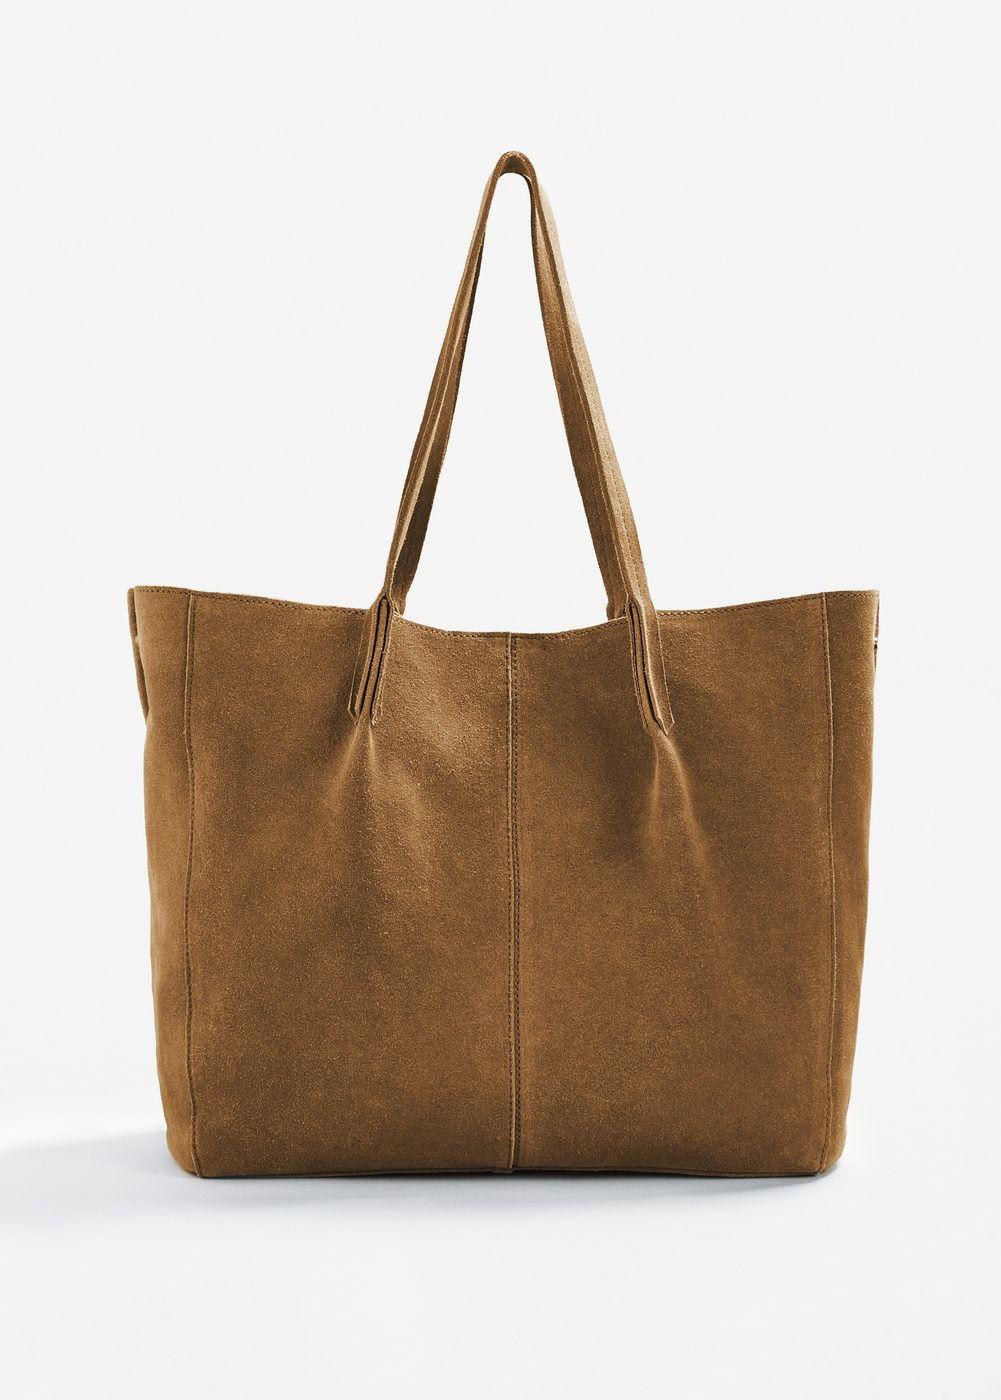 7073f7705 Bolso shopper piel - Mujer   Wishlist   Shopper bag, Metallic tote ...